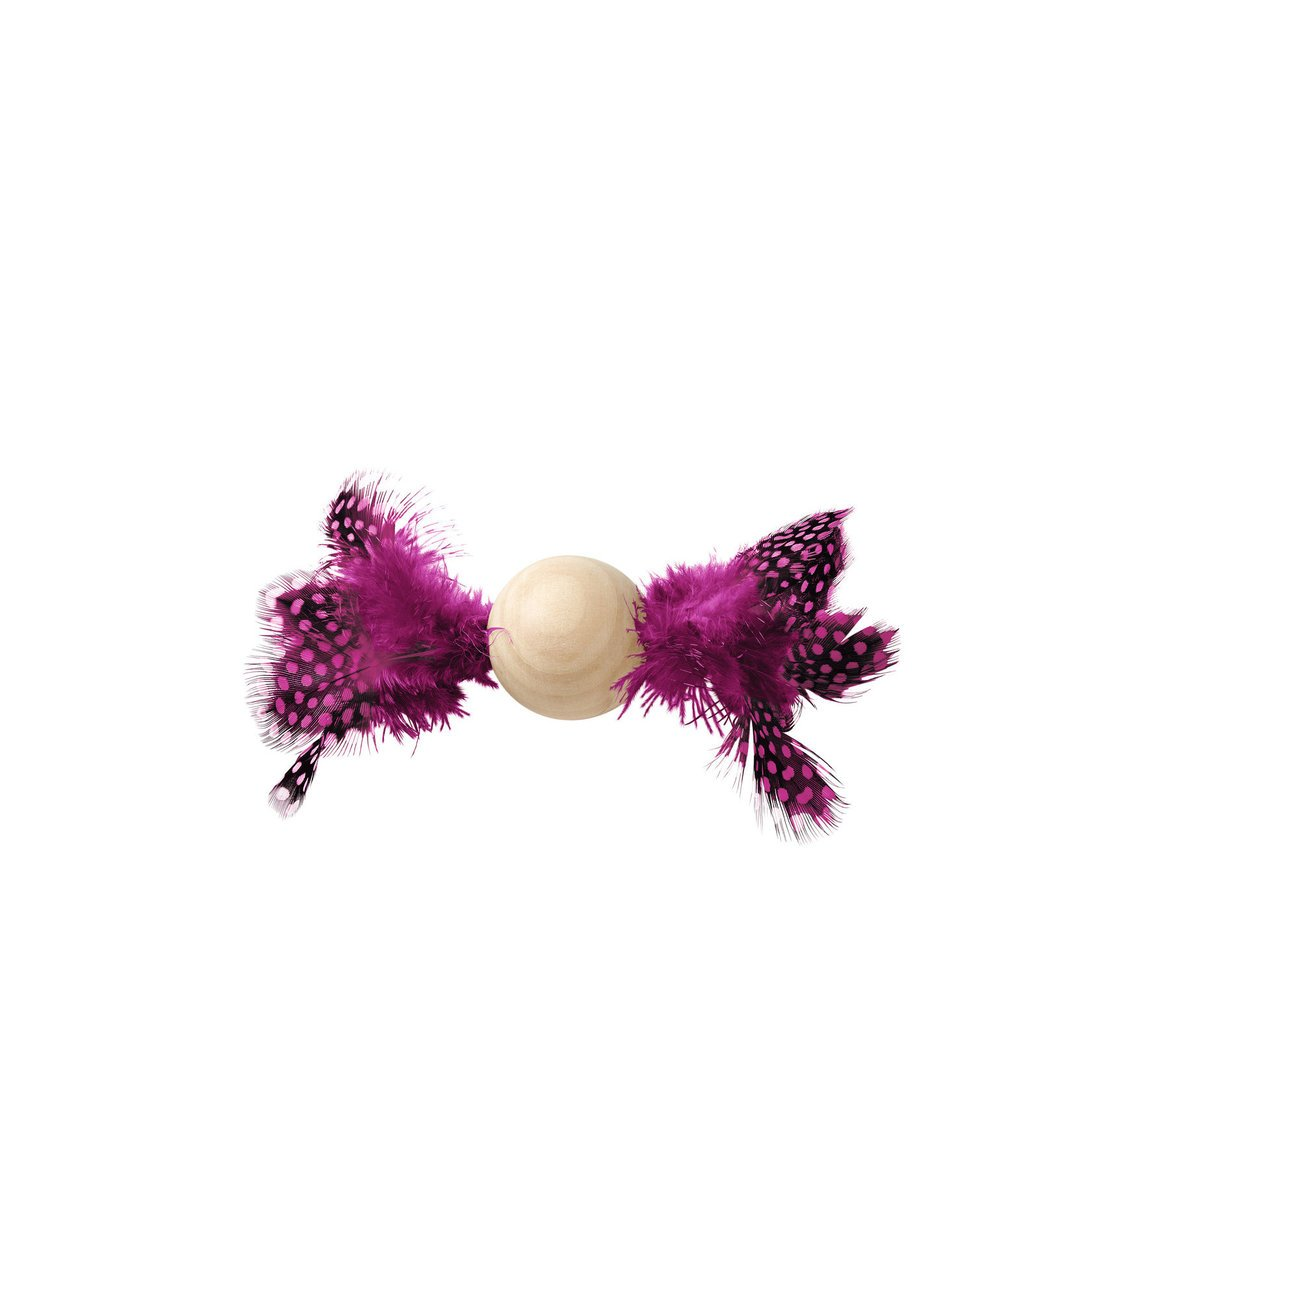 Hunter Katzenspielzeug Mala, Kugel, pink